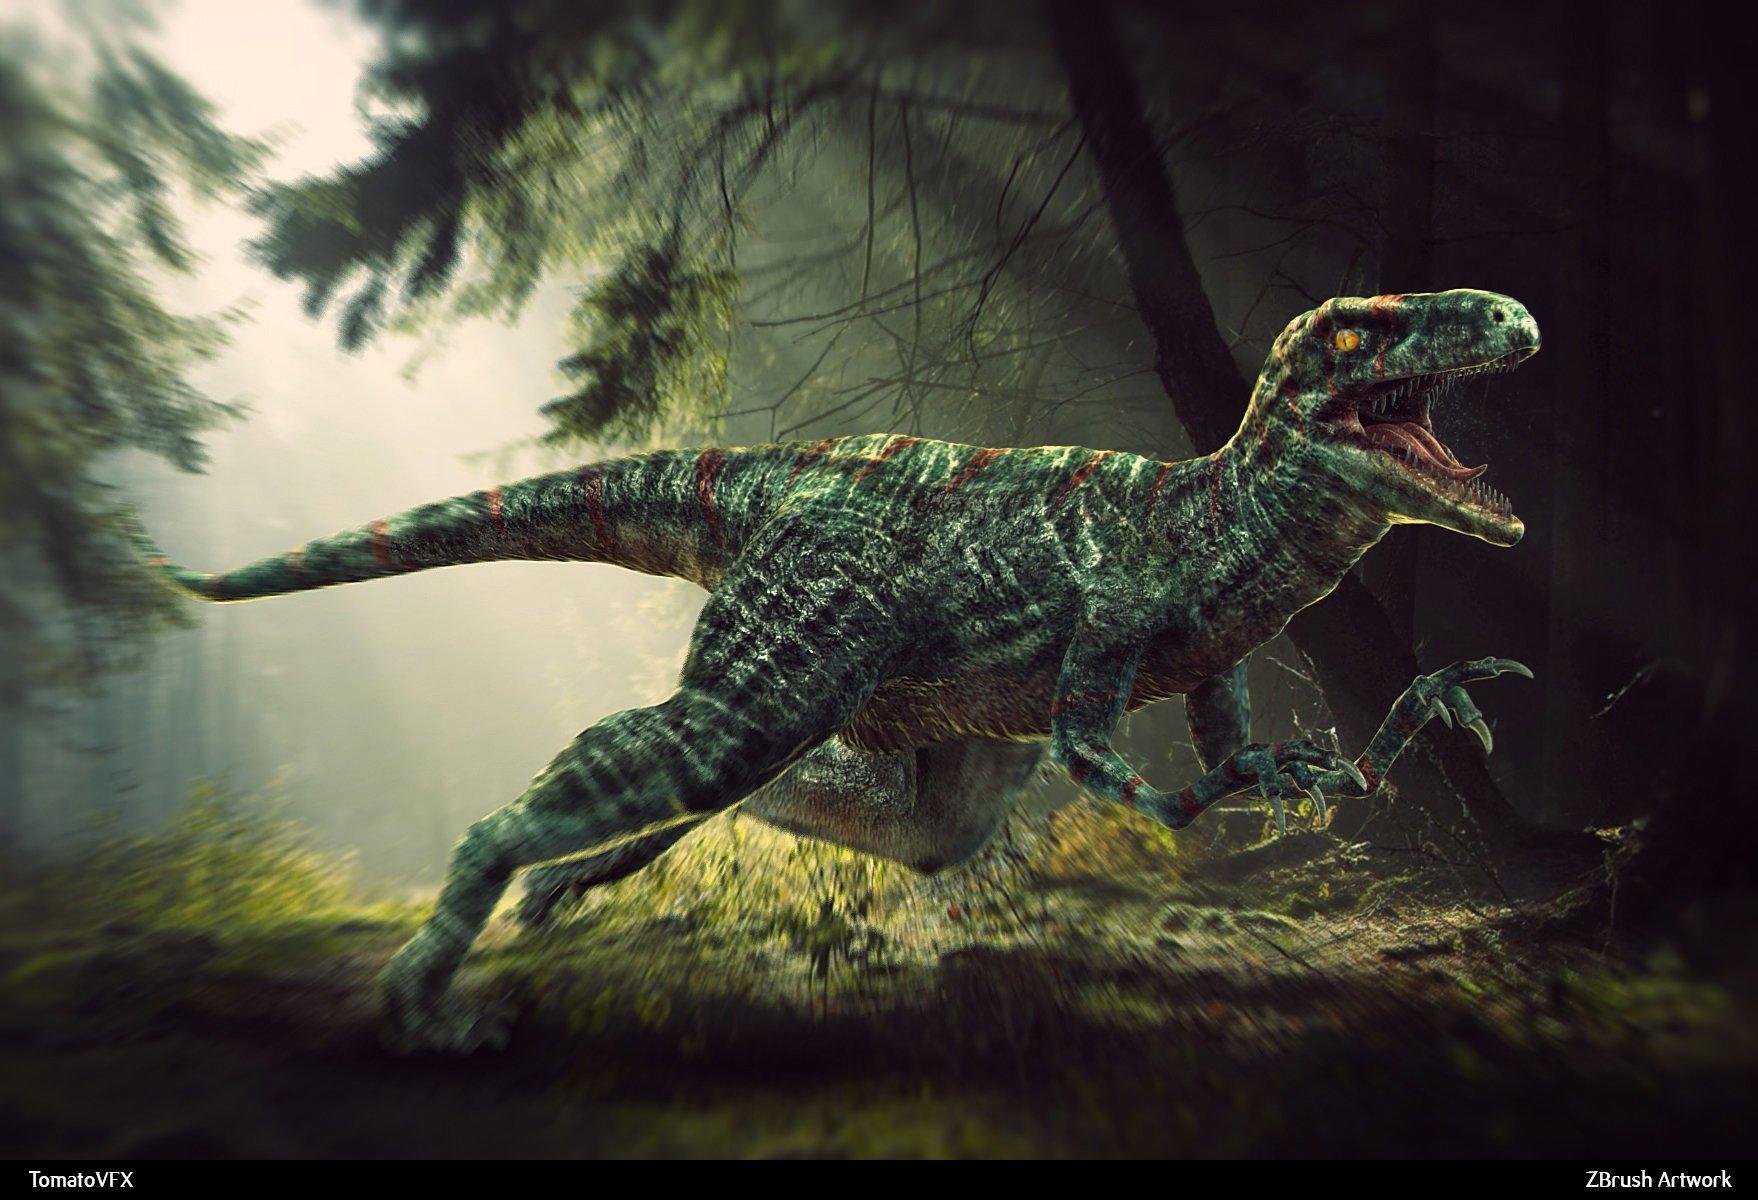 dinosaure velociraptor fond dcran hd arrire plan id694949